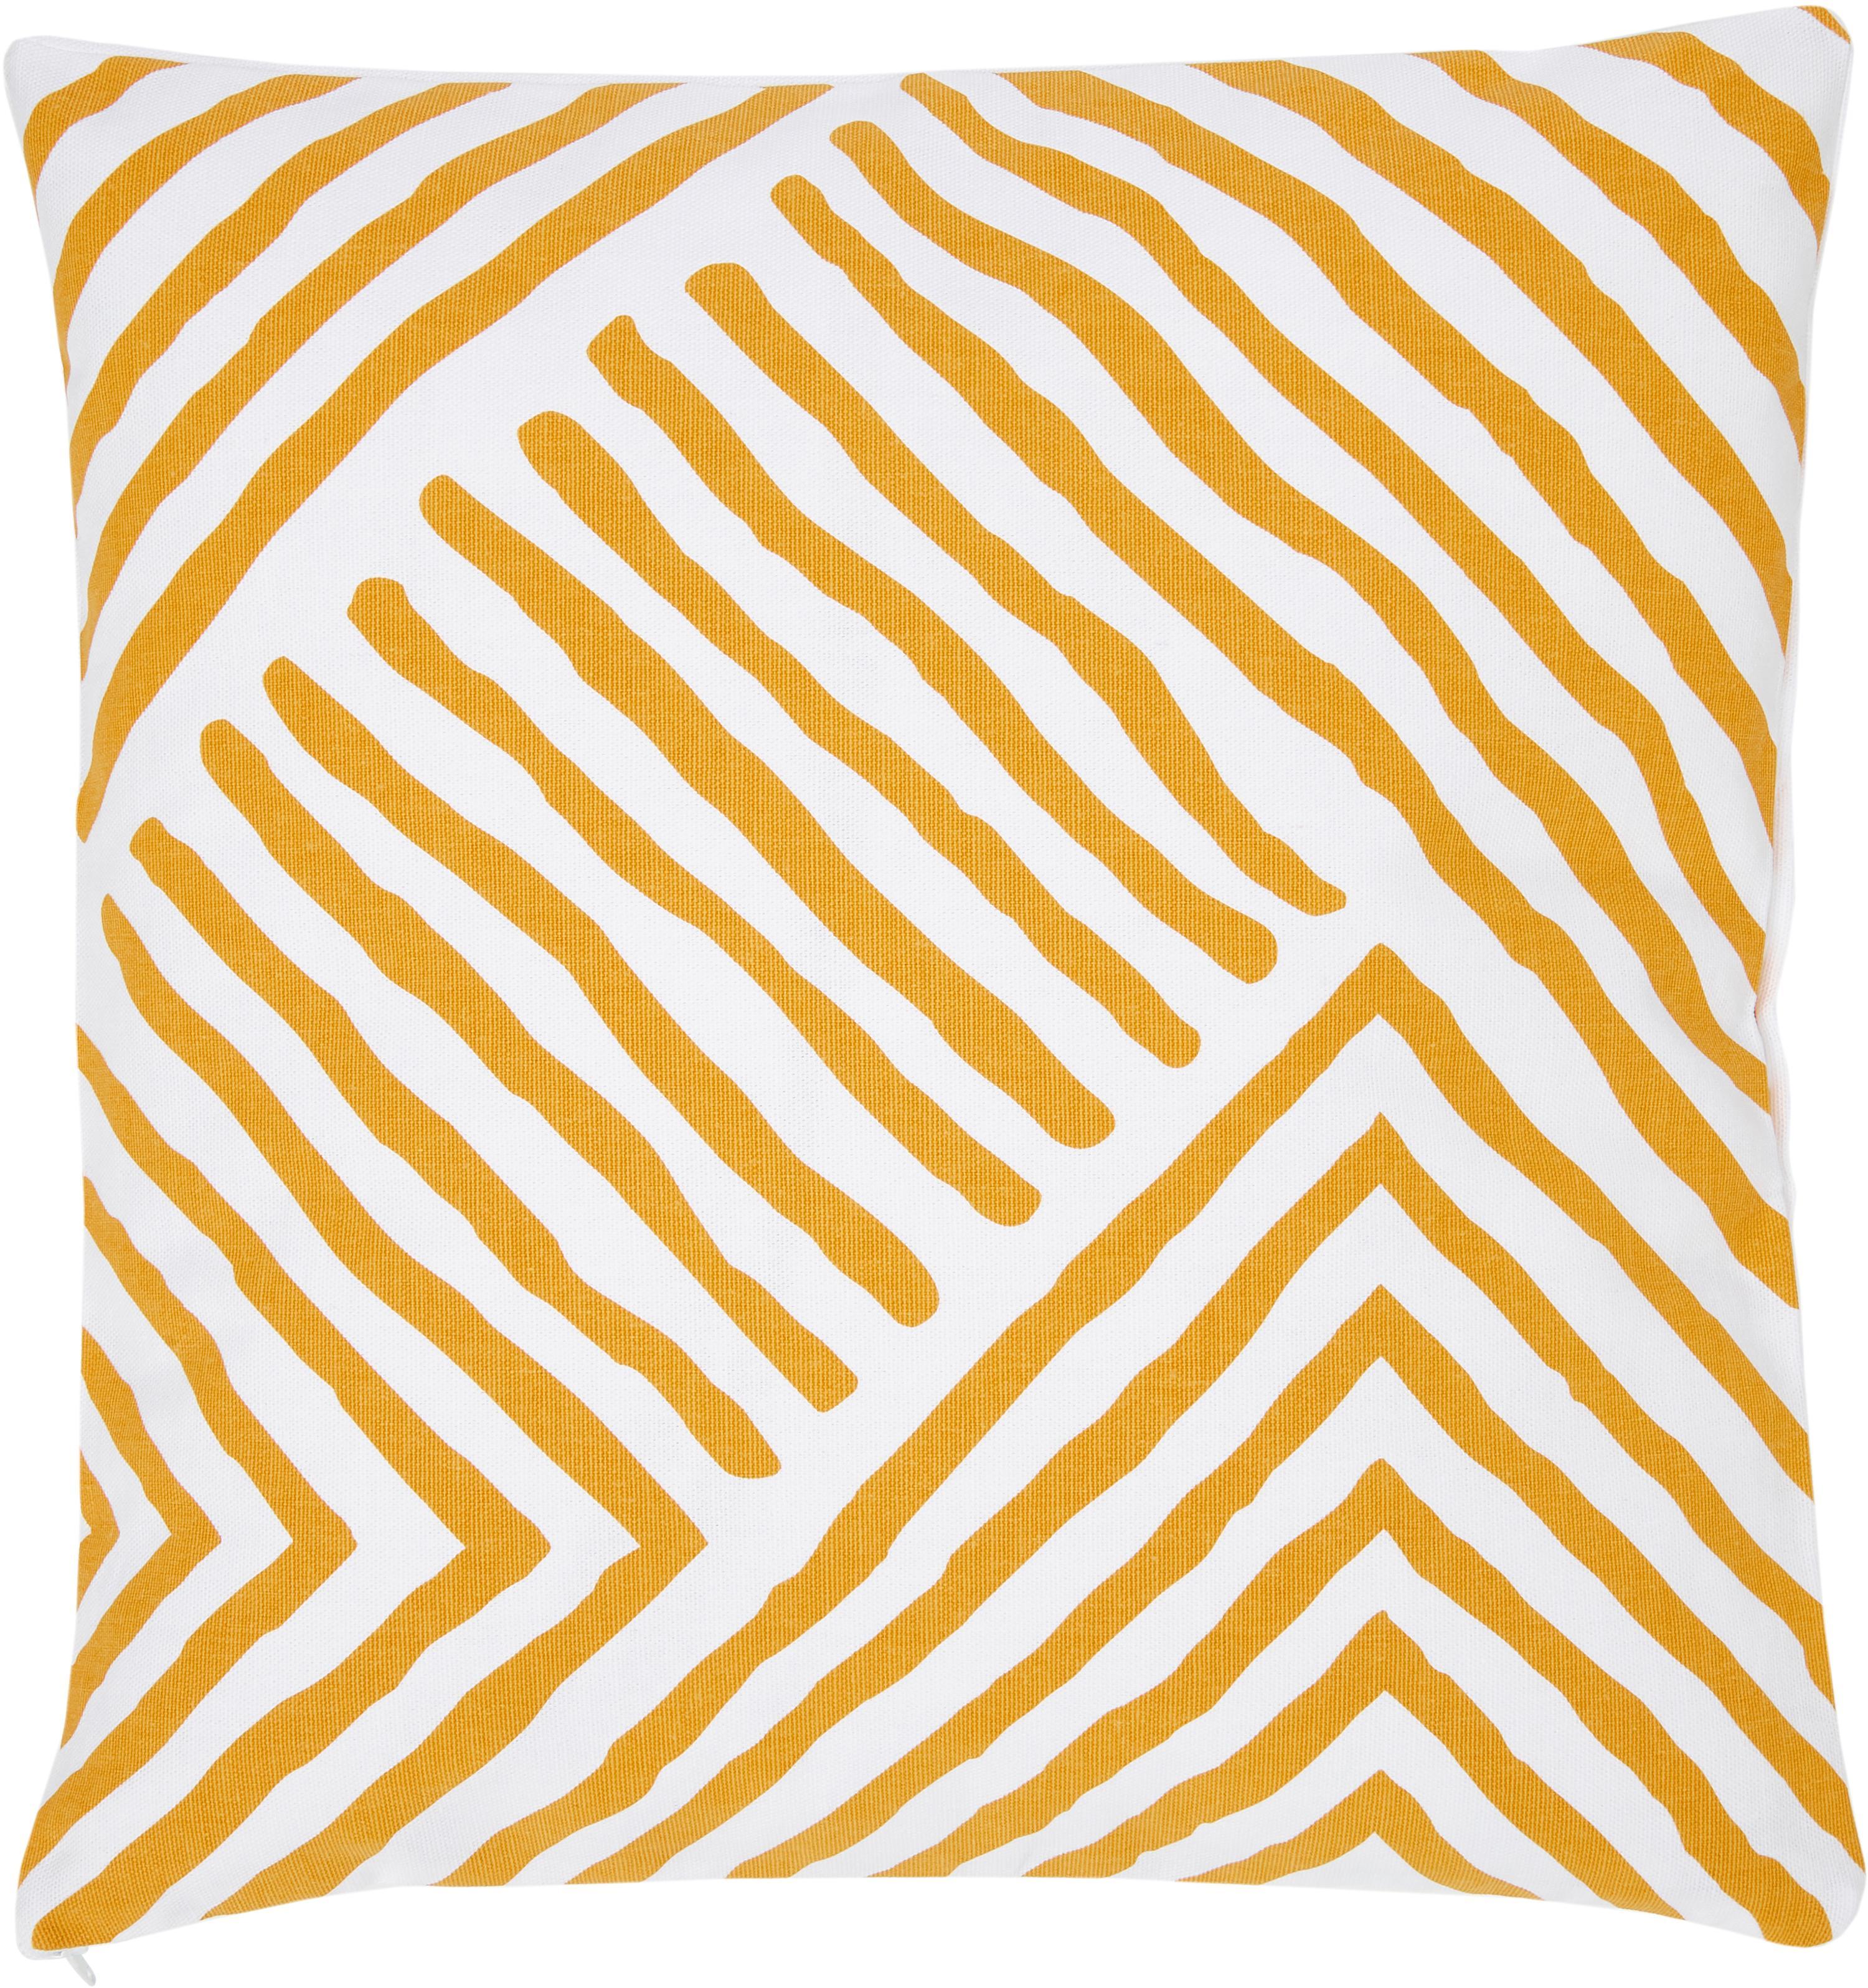 Funda de cojín Mia, Algodón, Amarillo, blanco, An 40 x L 40 cm